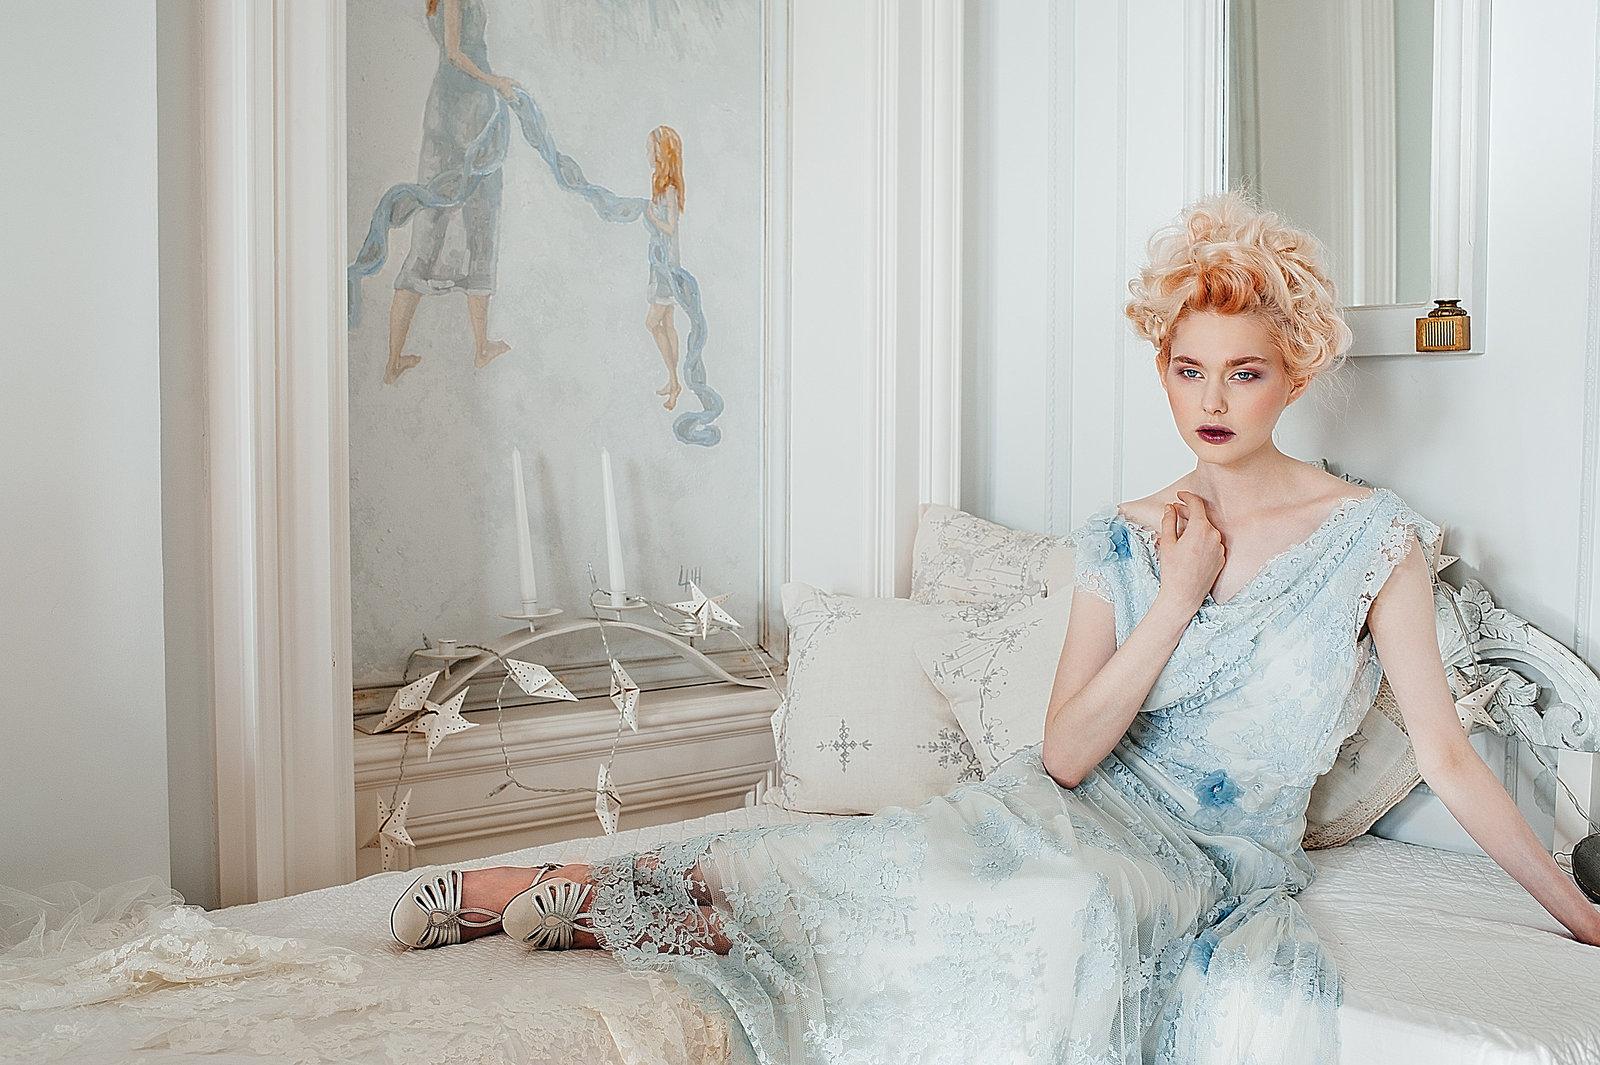 Harebell_pale_blue_lace_wedding_dress_JoanneFlemingDesign (4)